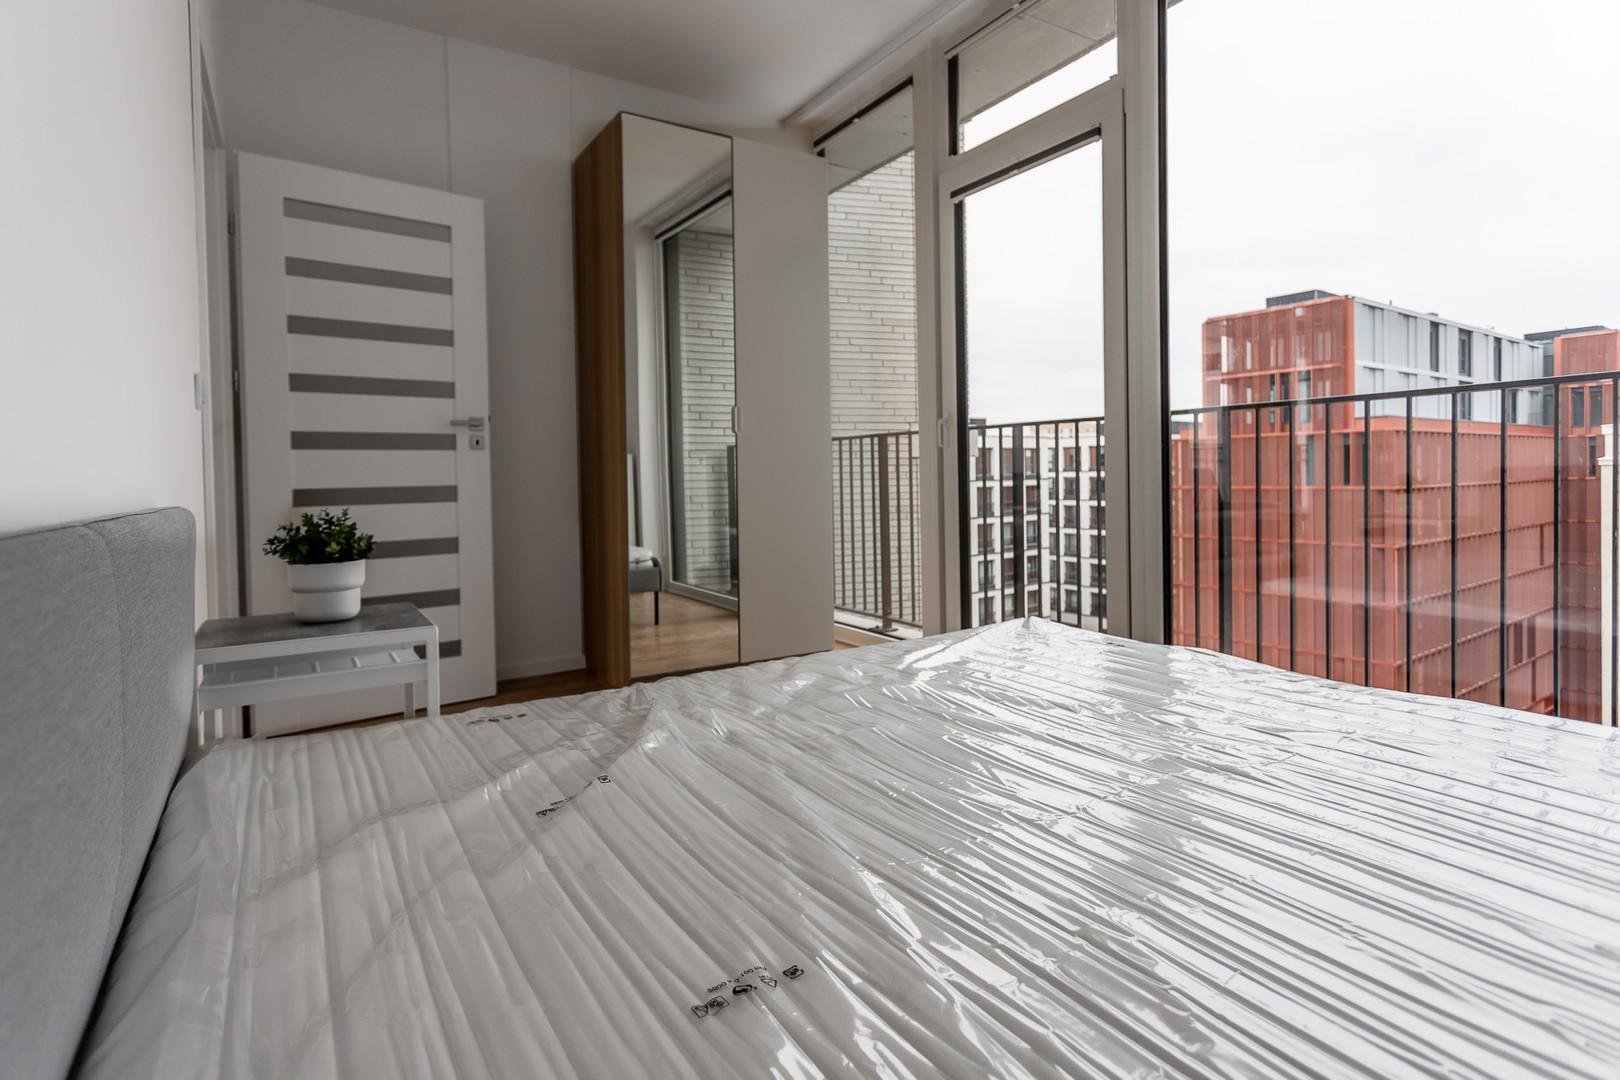 Poznan 2 bedroom apartments for rent-8.j